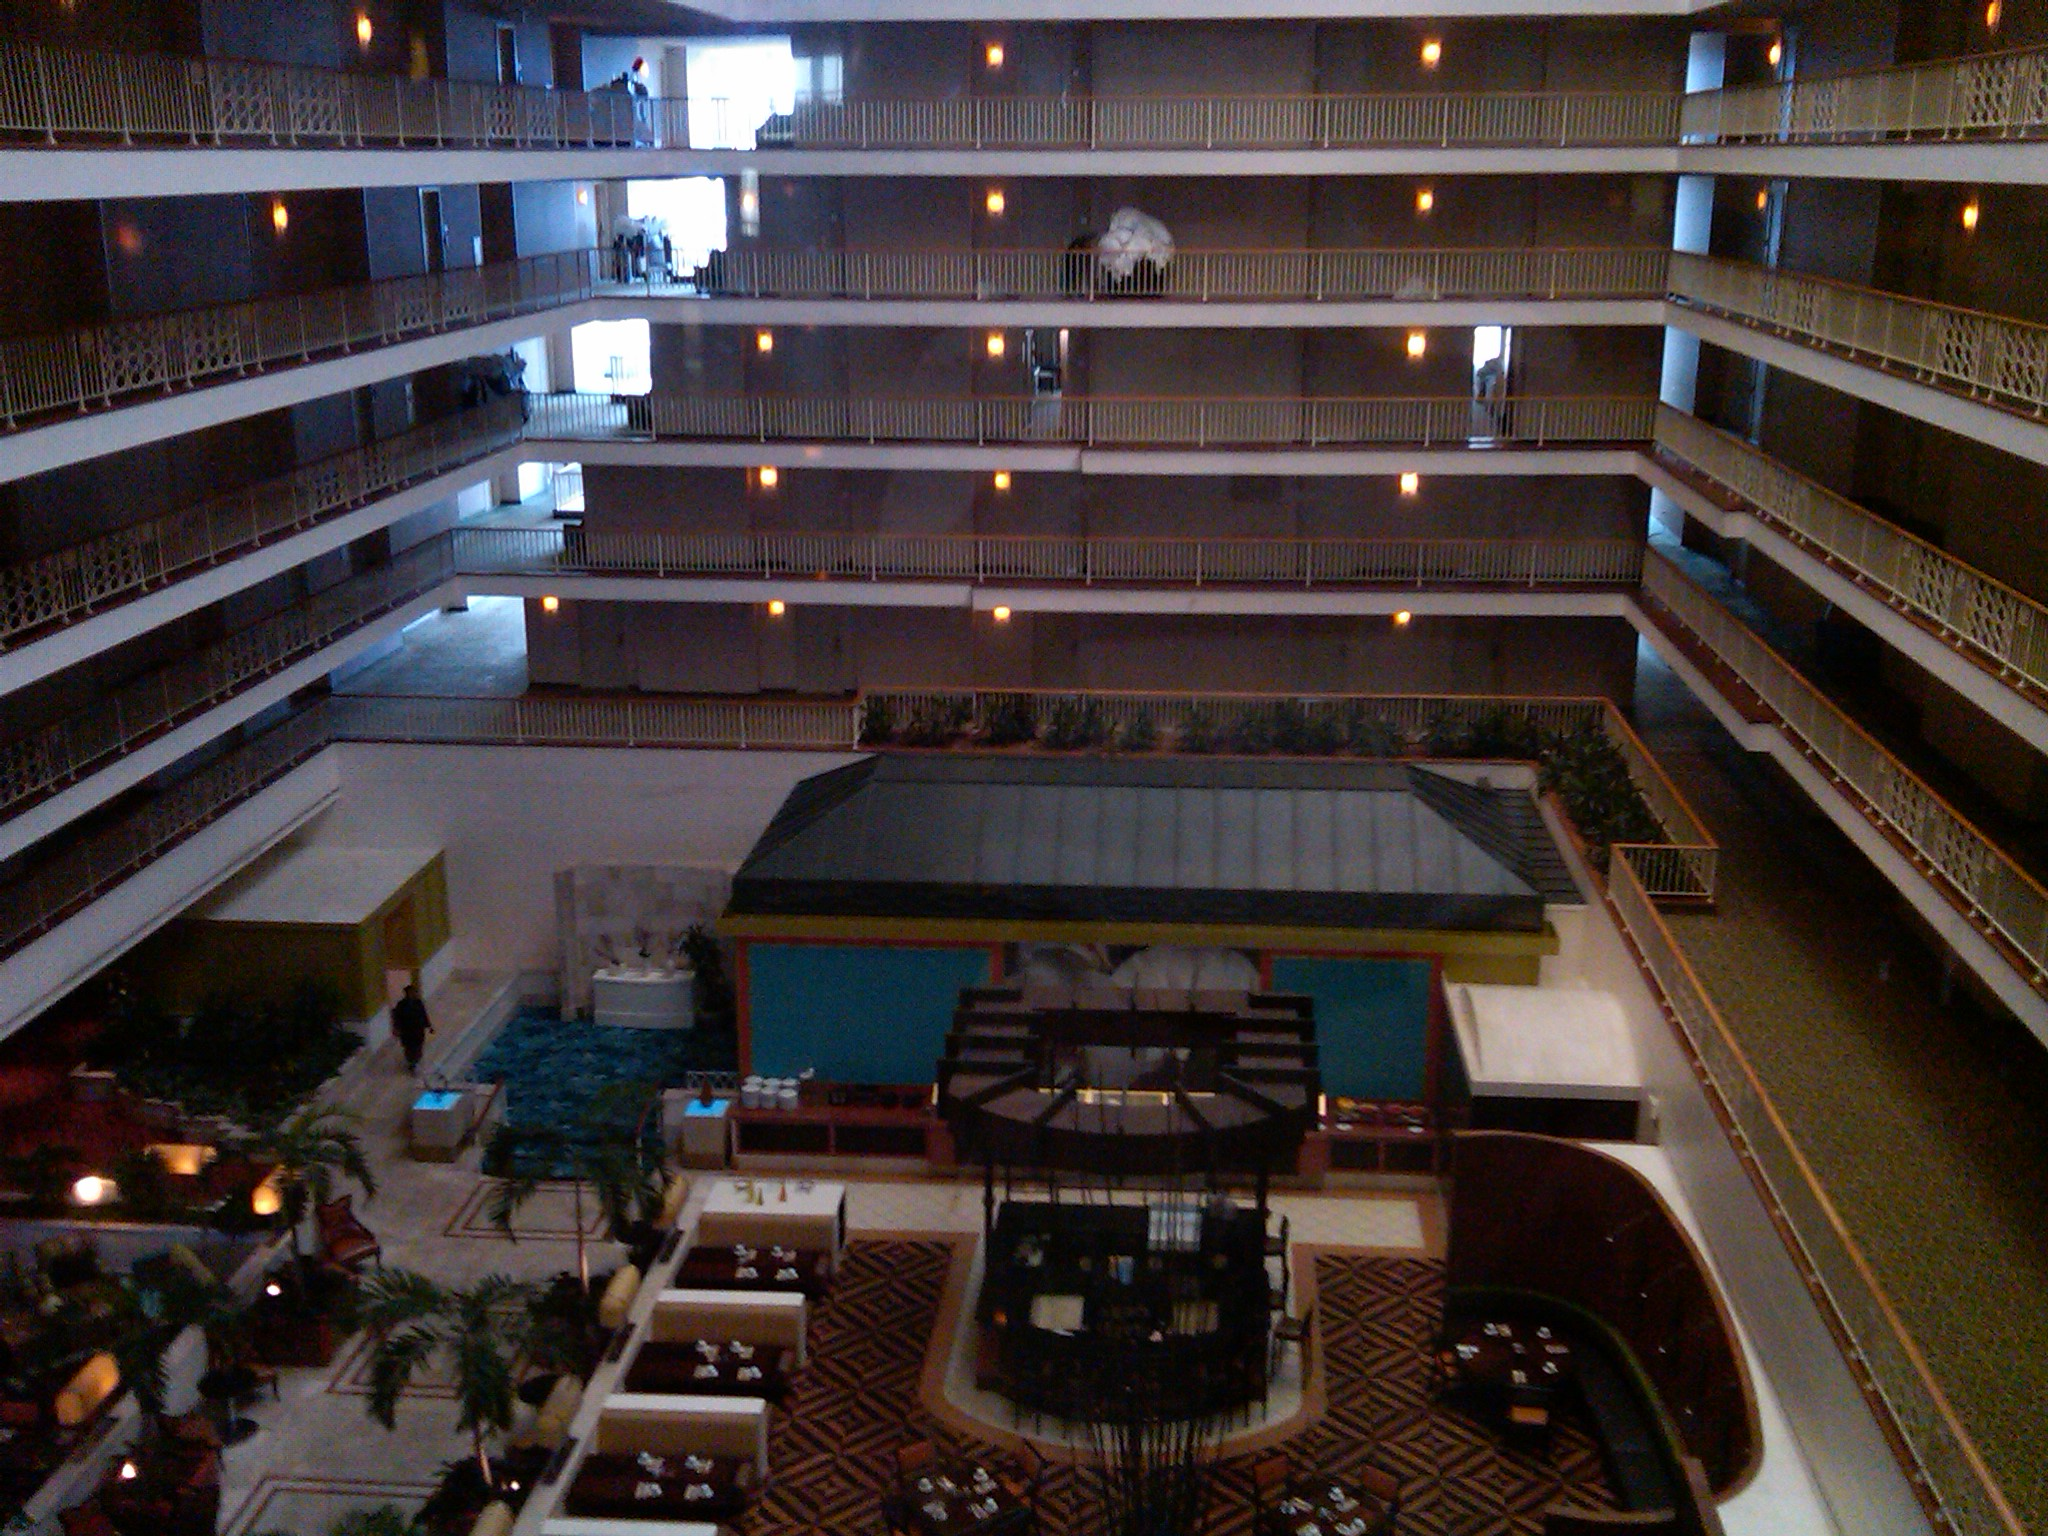 Renaissance Concourse Hotel Atlanta Georgia